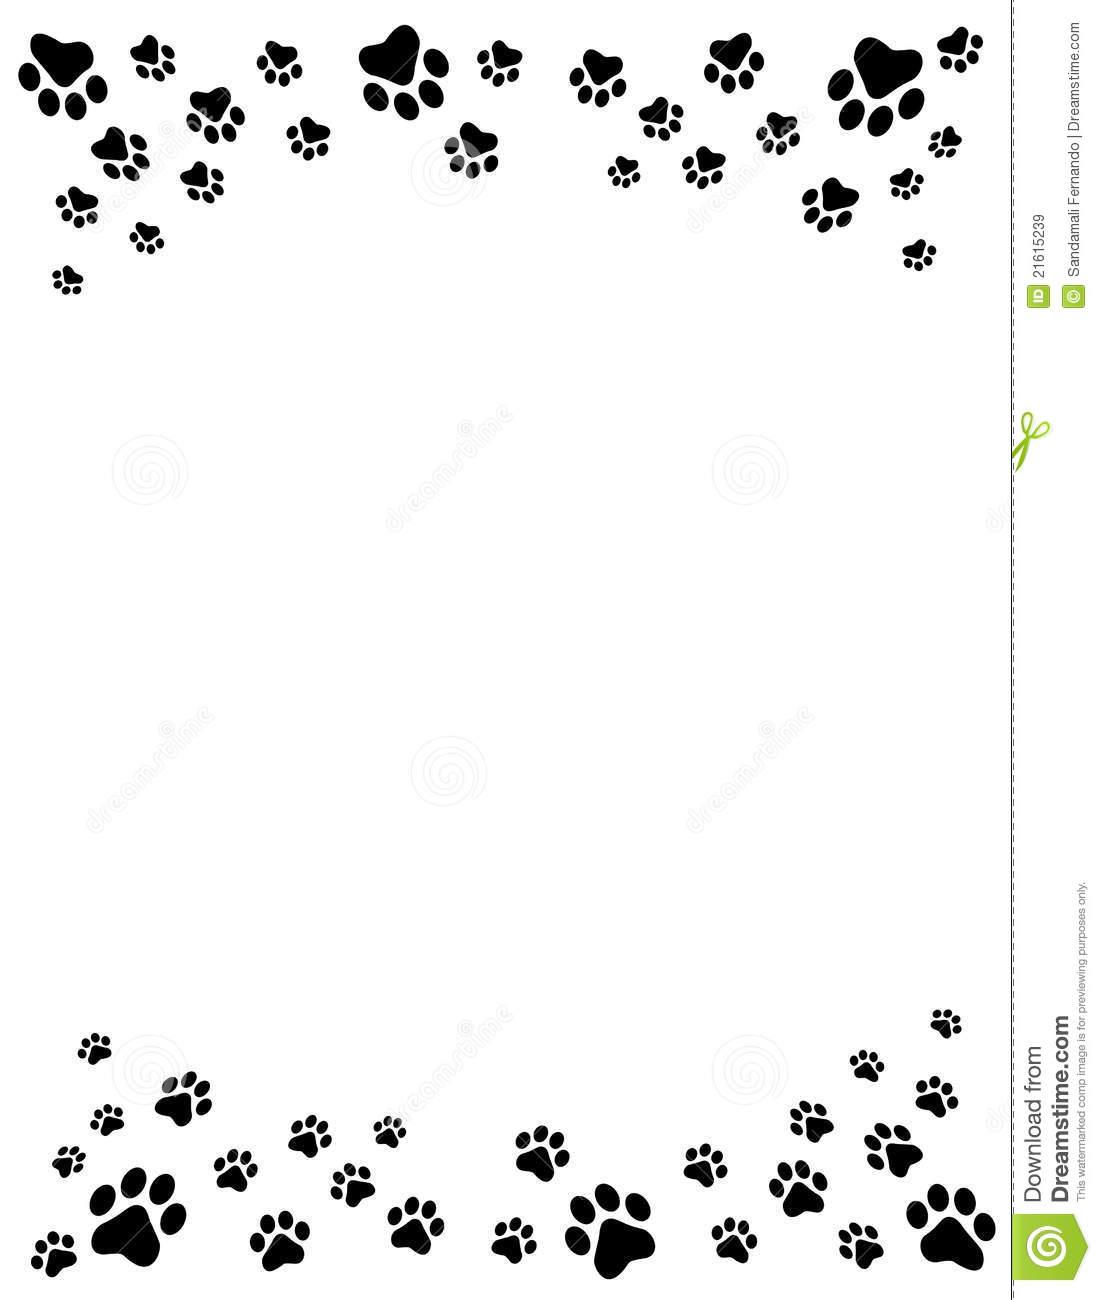 Frame clipart animal print Printable #3800 Kids Design Faces